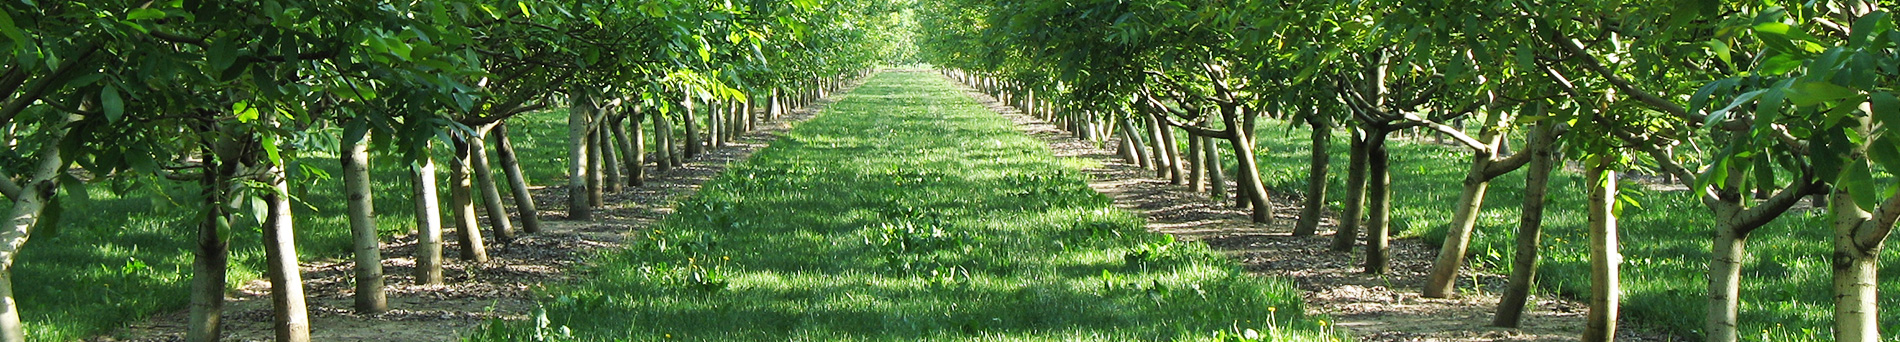 Coltivazione del noce - Growing of walnut trees